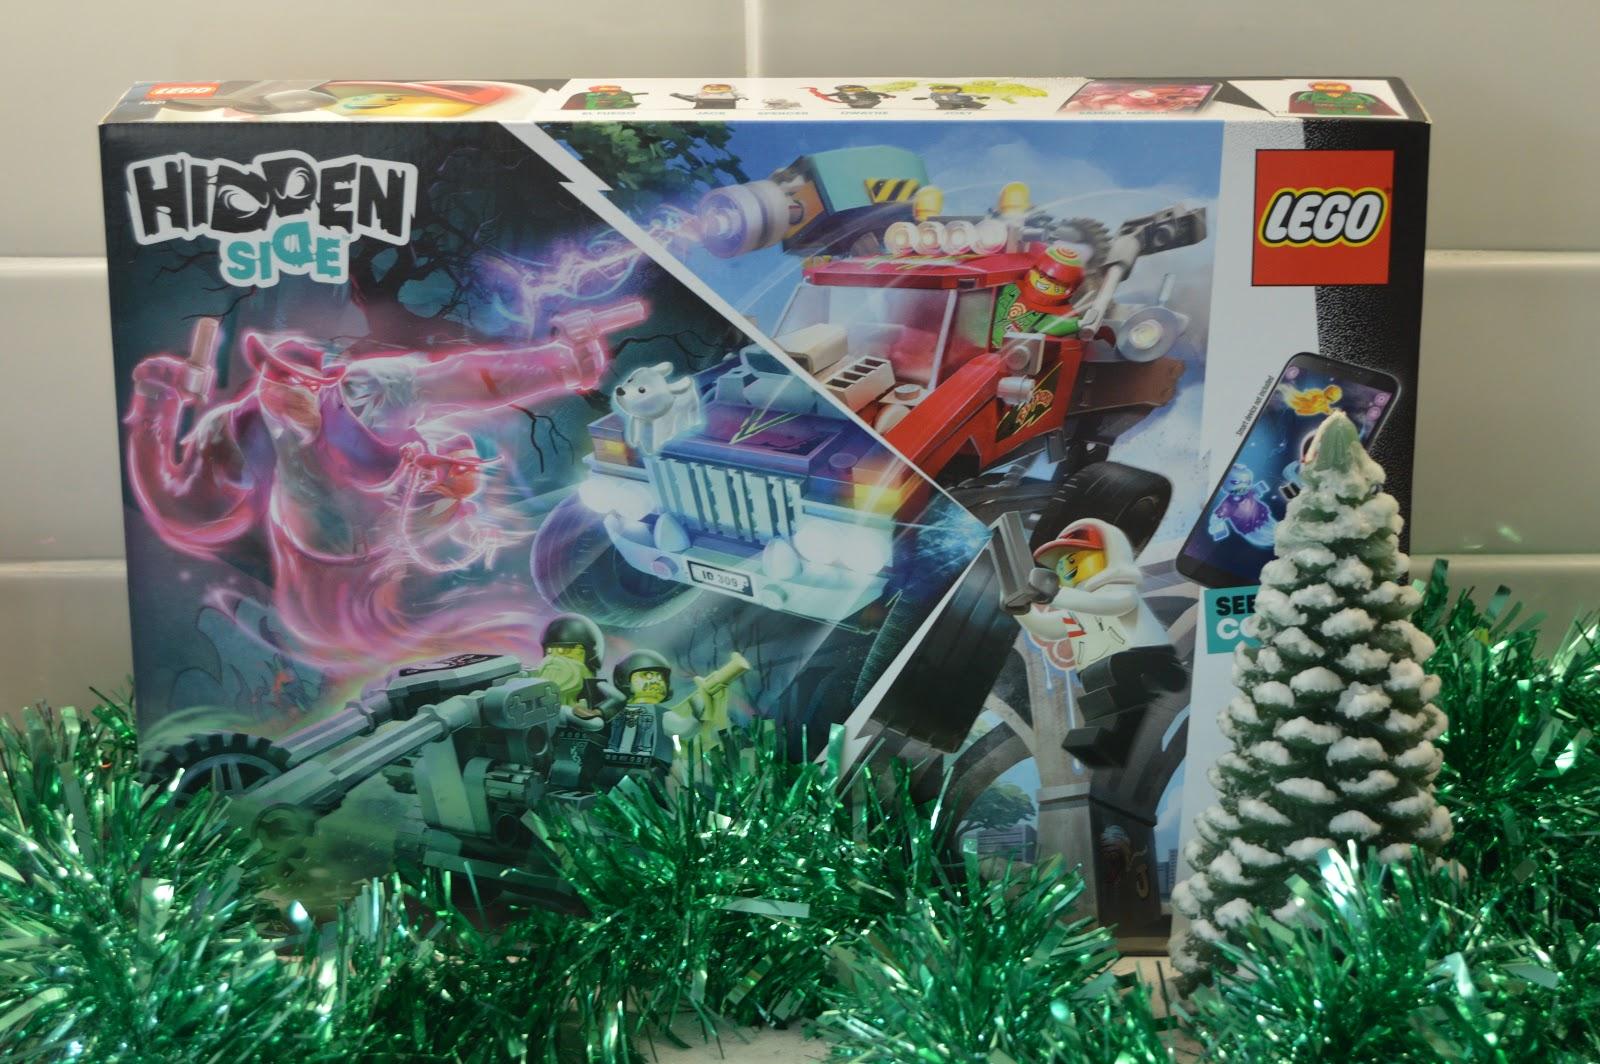 hiden side lego set